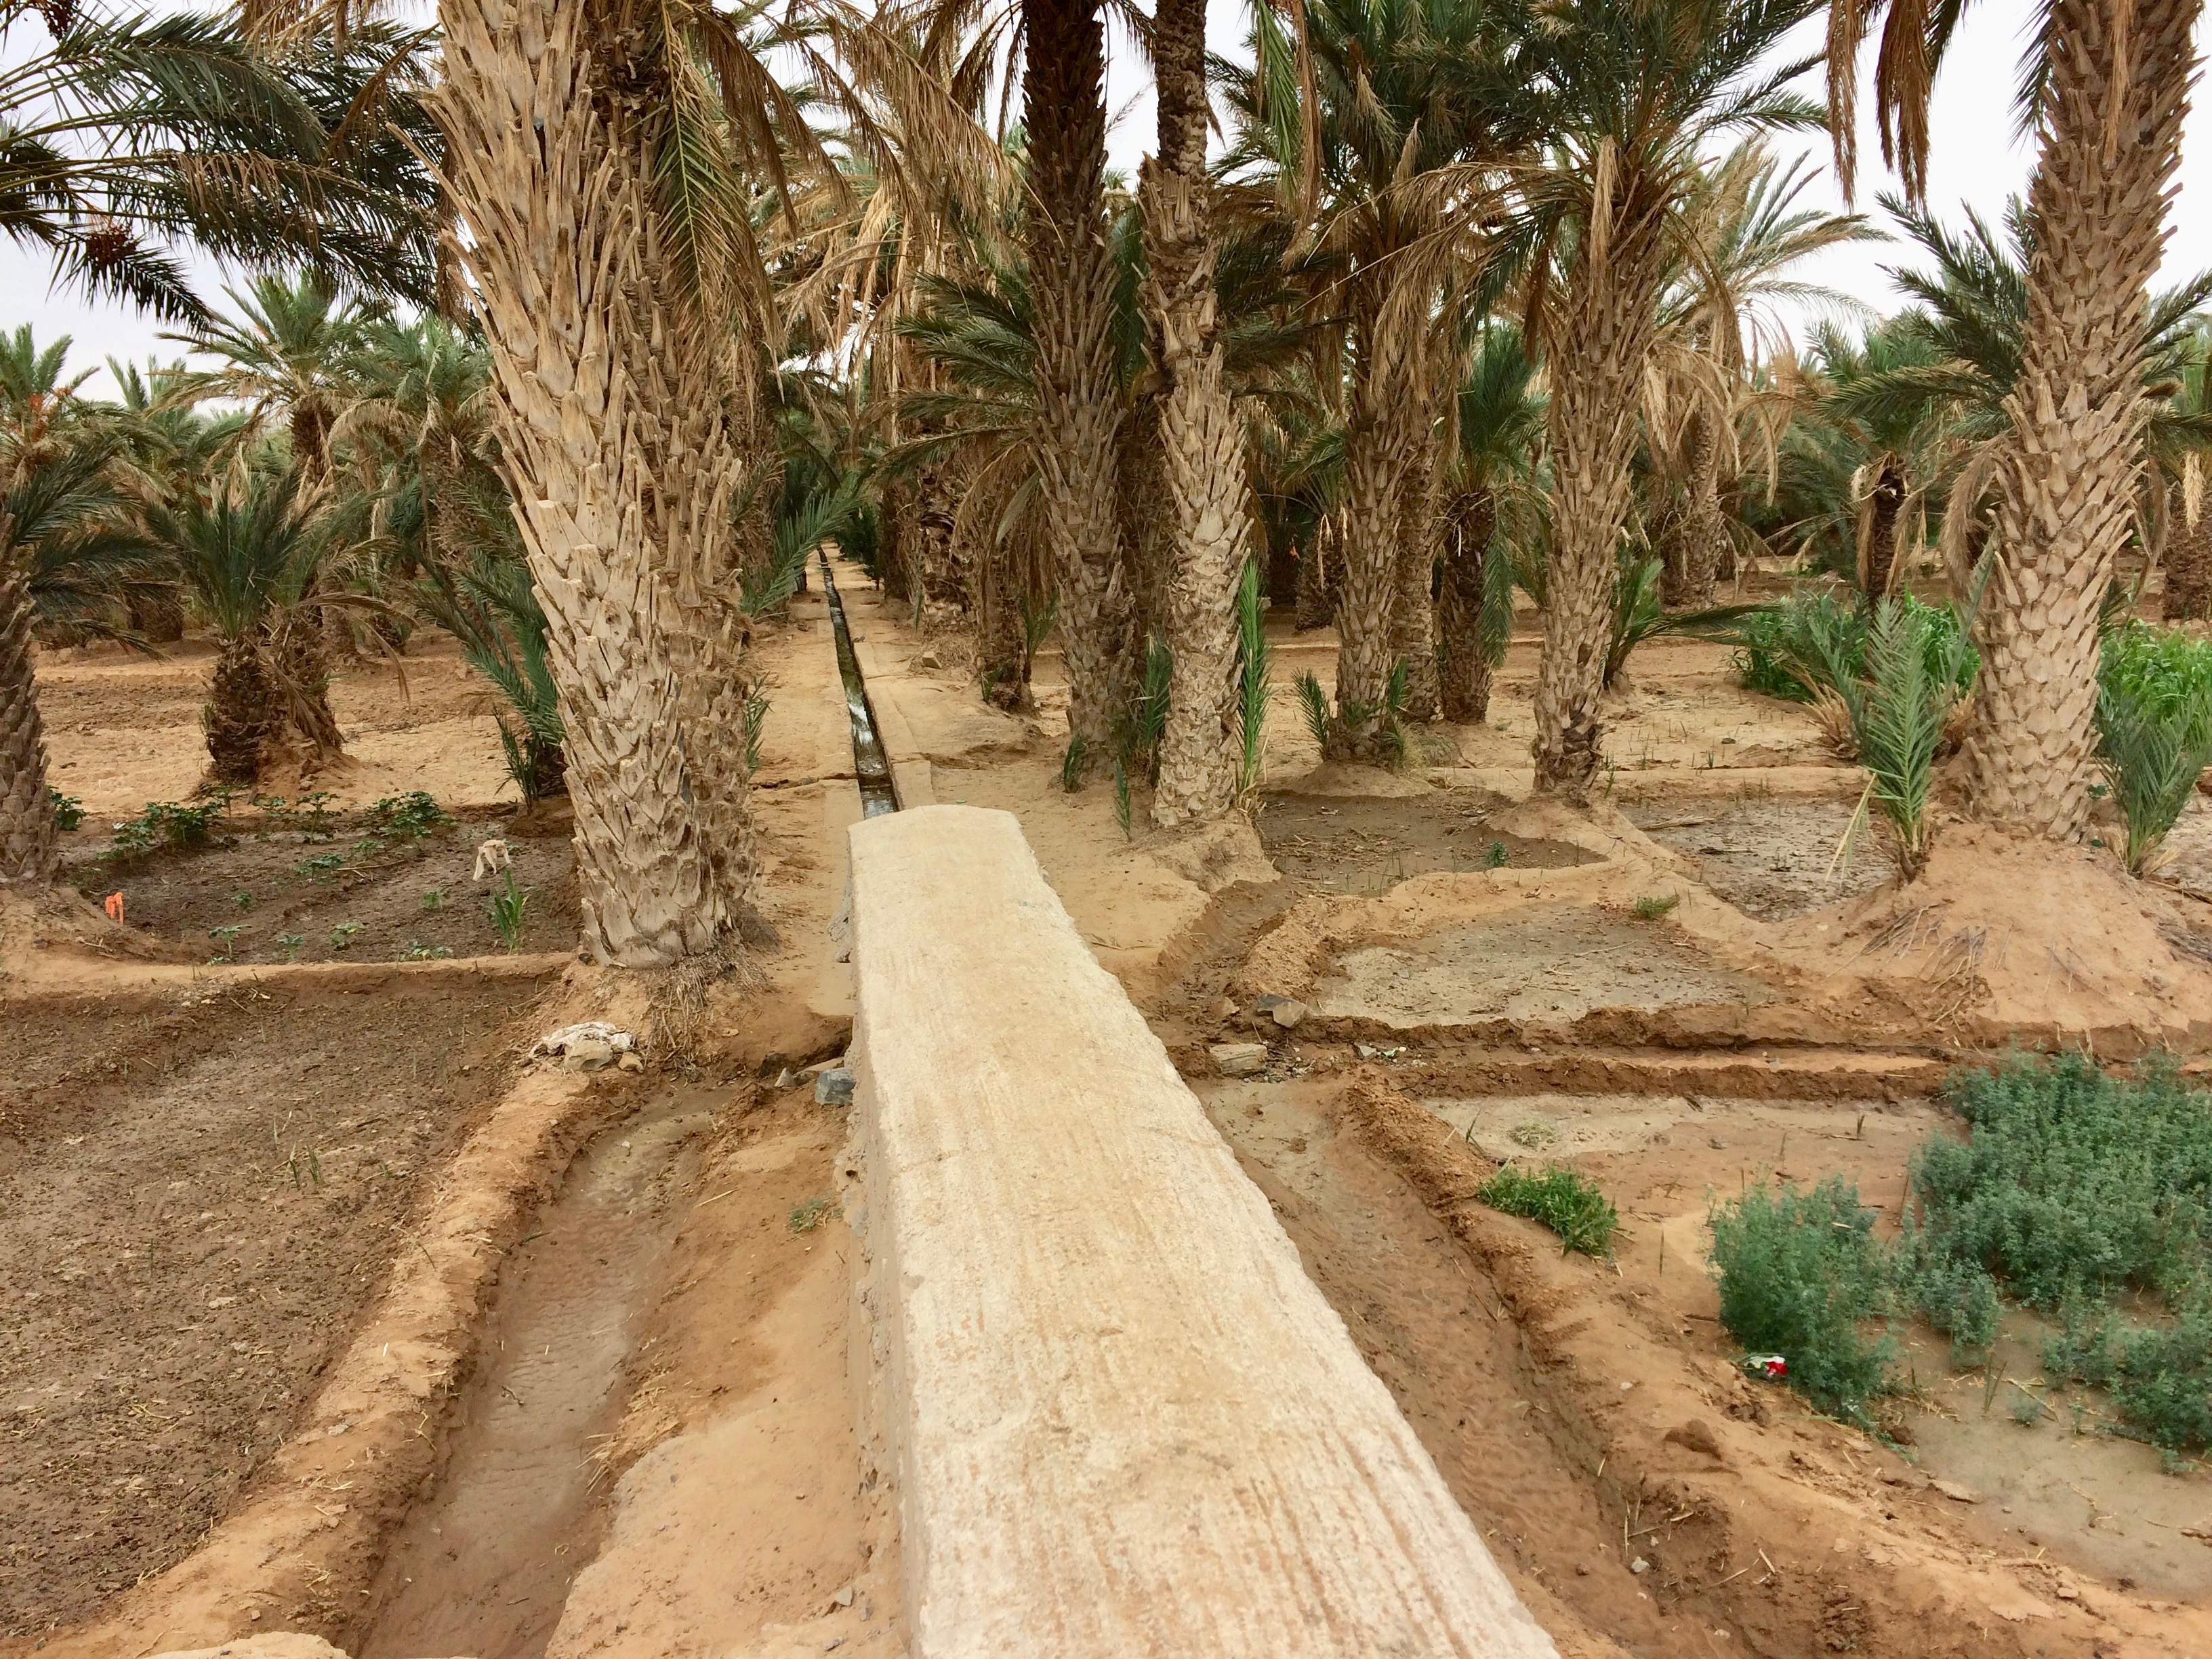 Oasis irrigation via seguia